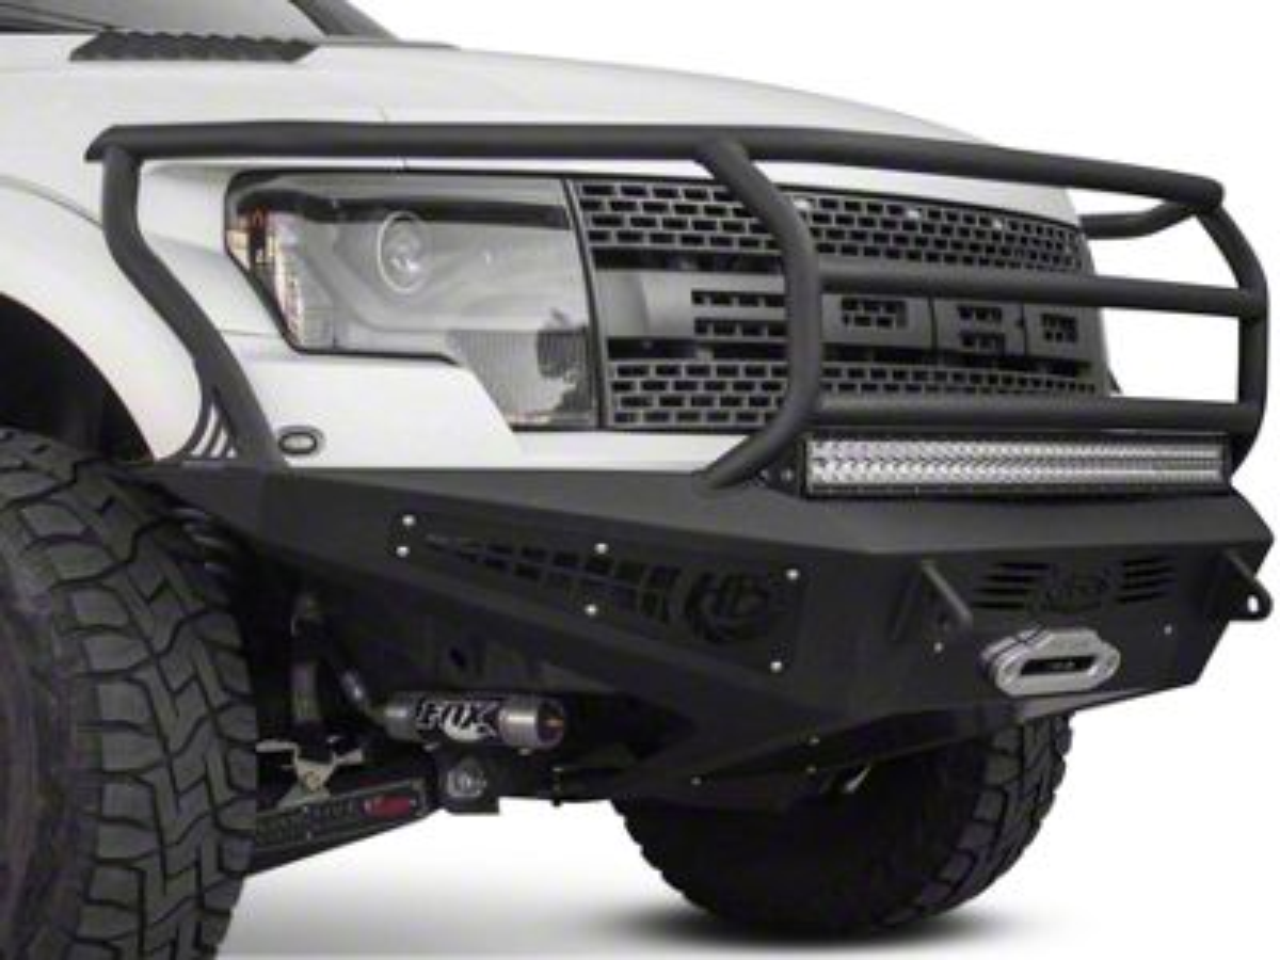 Addictive Desert Designs HoneyBadger Rancher Front Bumper w/ Winch Mount (10-14 F-150 Raptor)